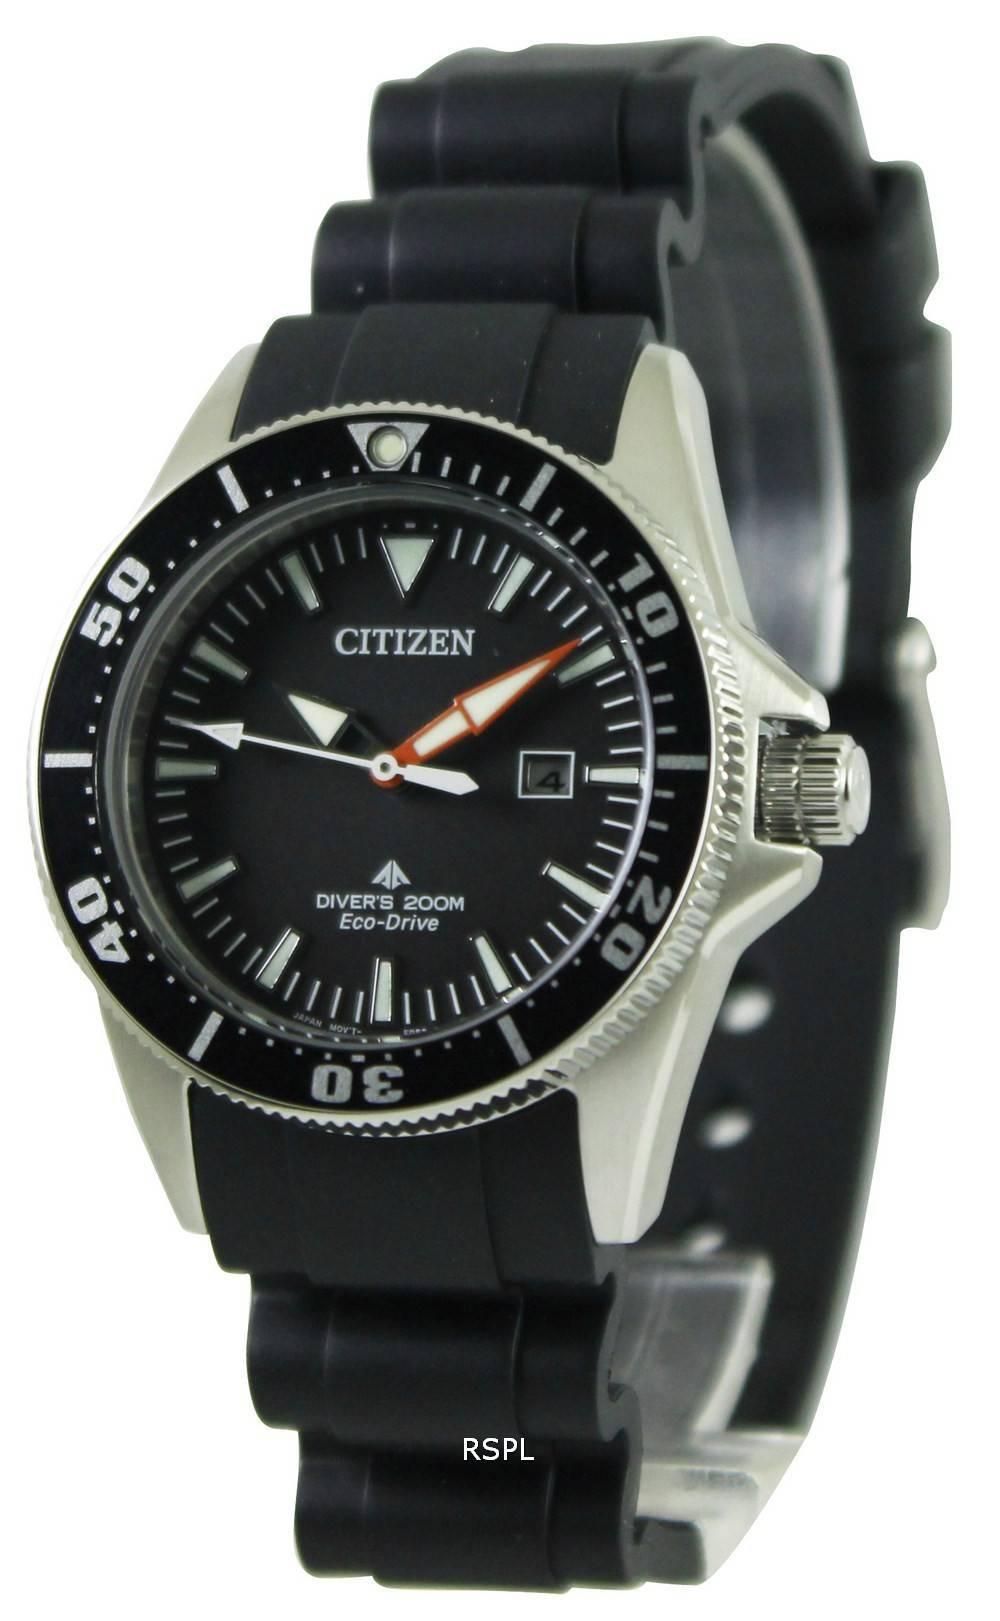 Citizen eco drive promaster divers ep6040 02e womens watch for Citizen eco dive